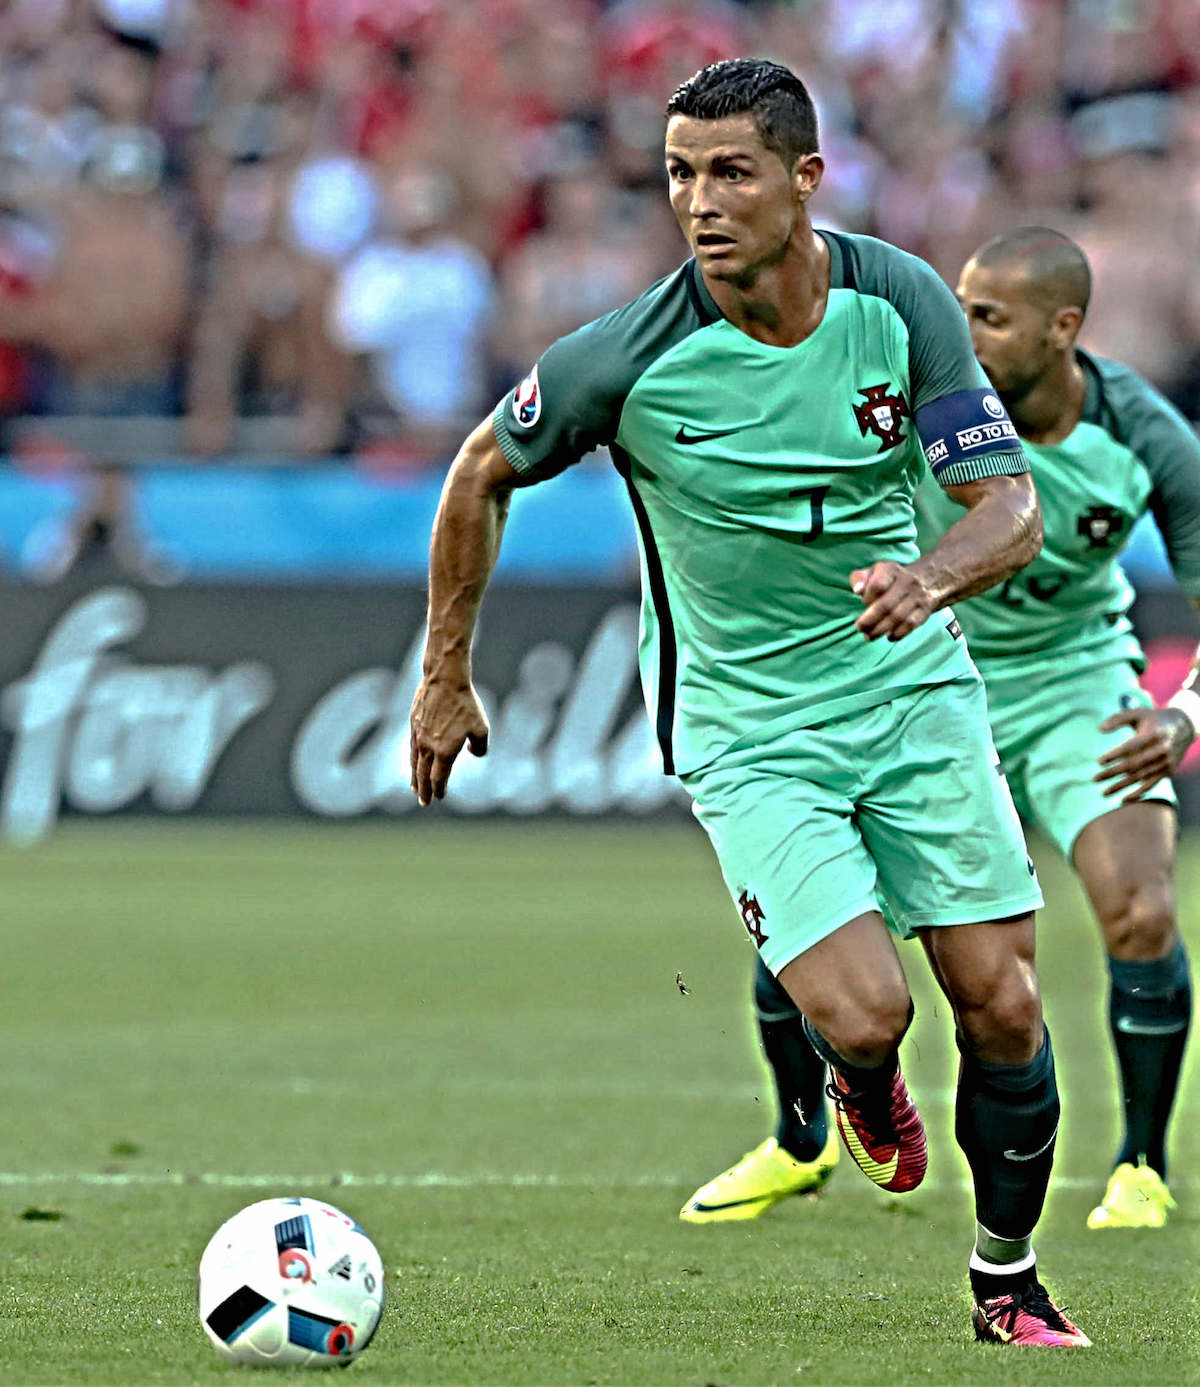 Cristiano_Ronaldo_runs_with_the_ball_during_a_match_football4football